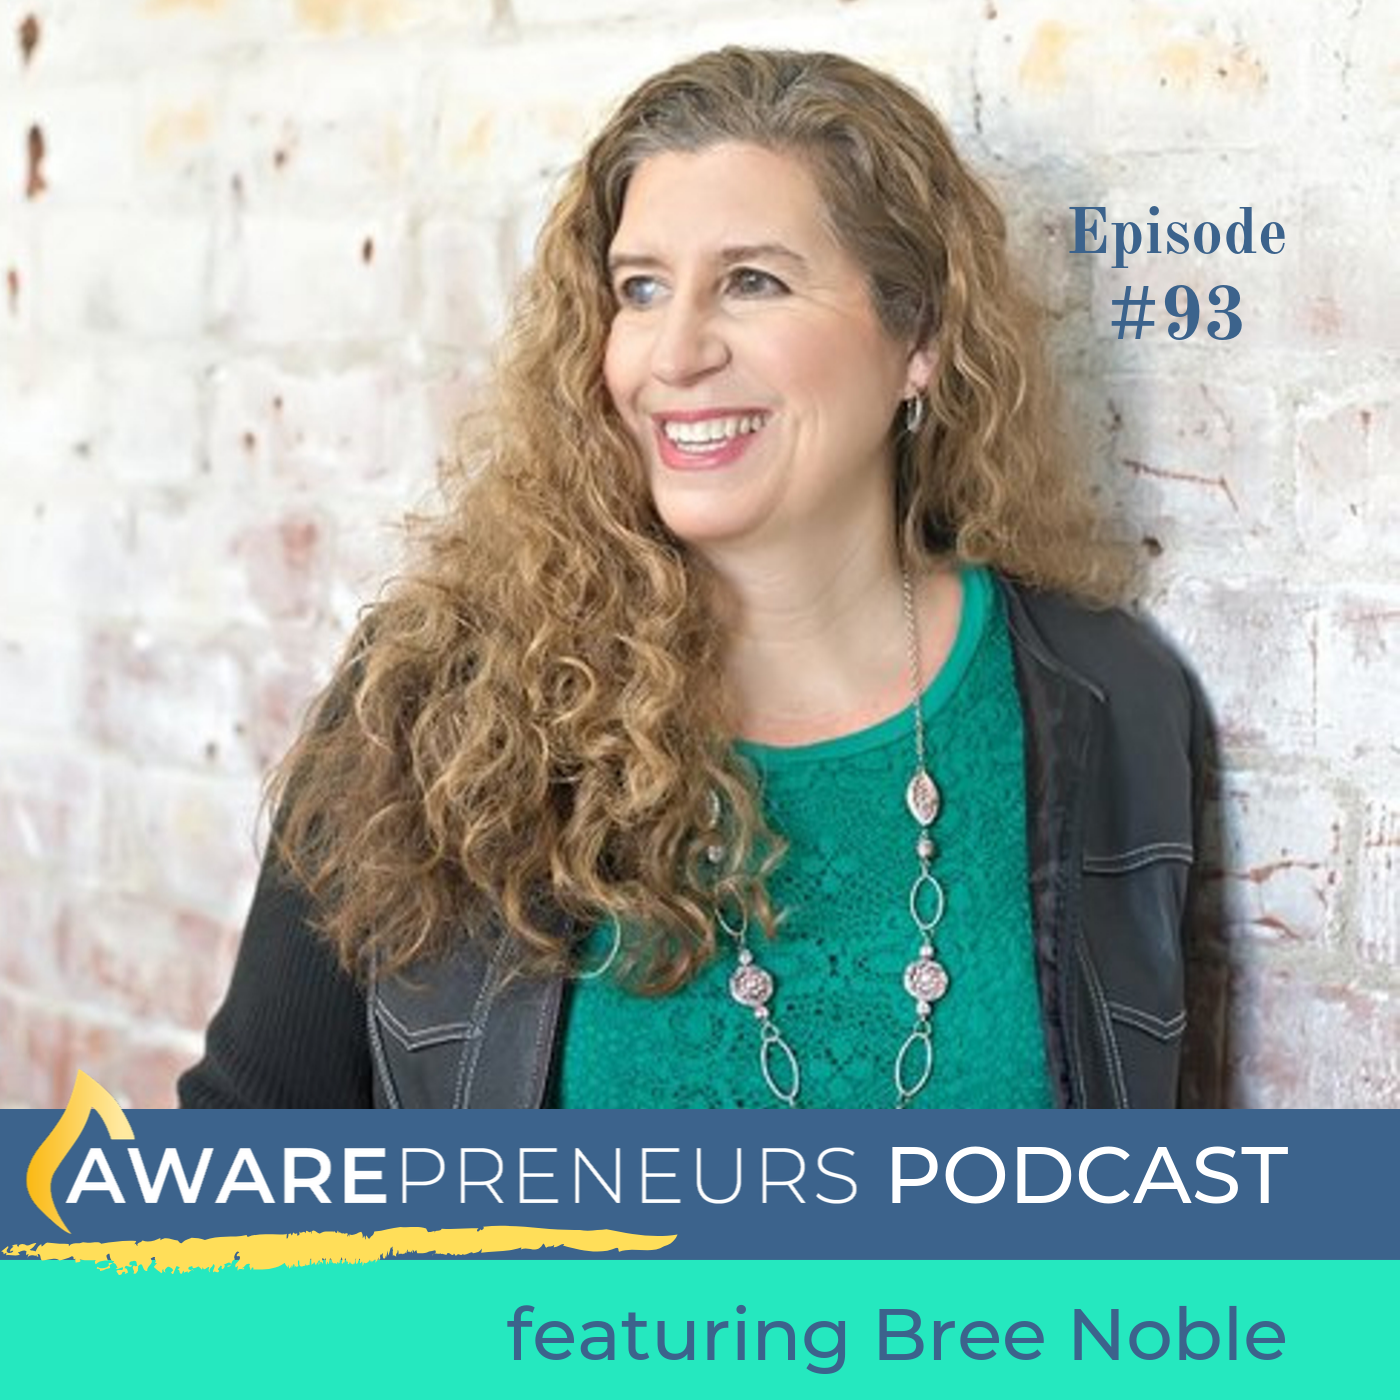 Go deep into my back story on the  Awarepreneur Podcast